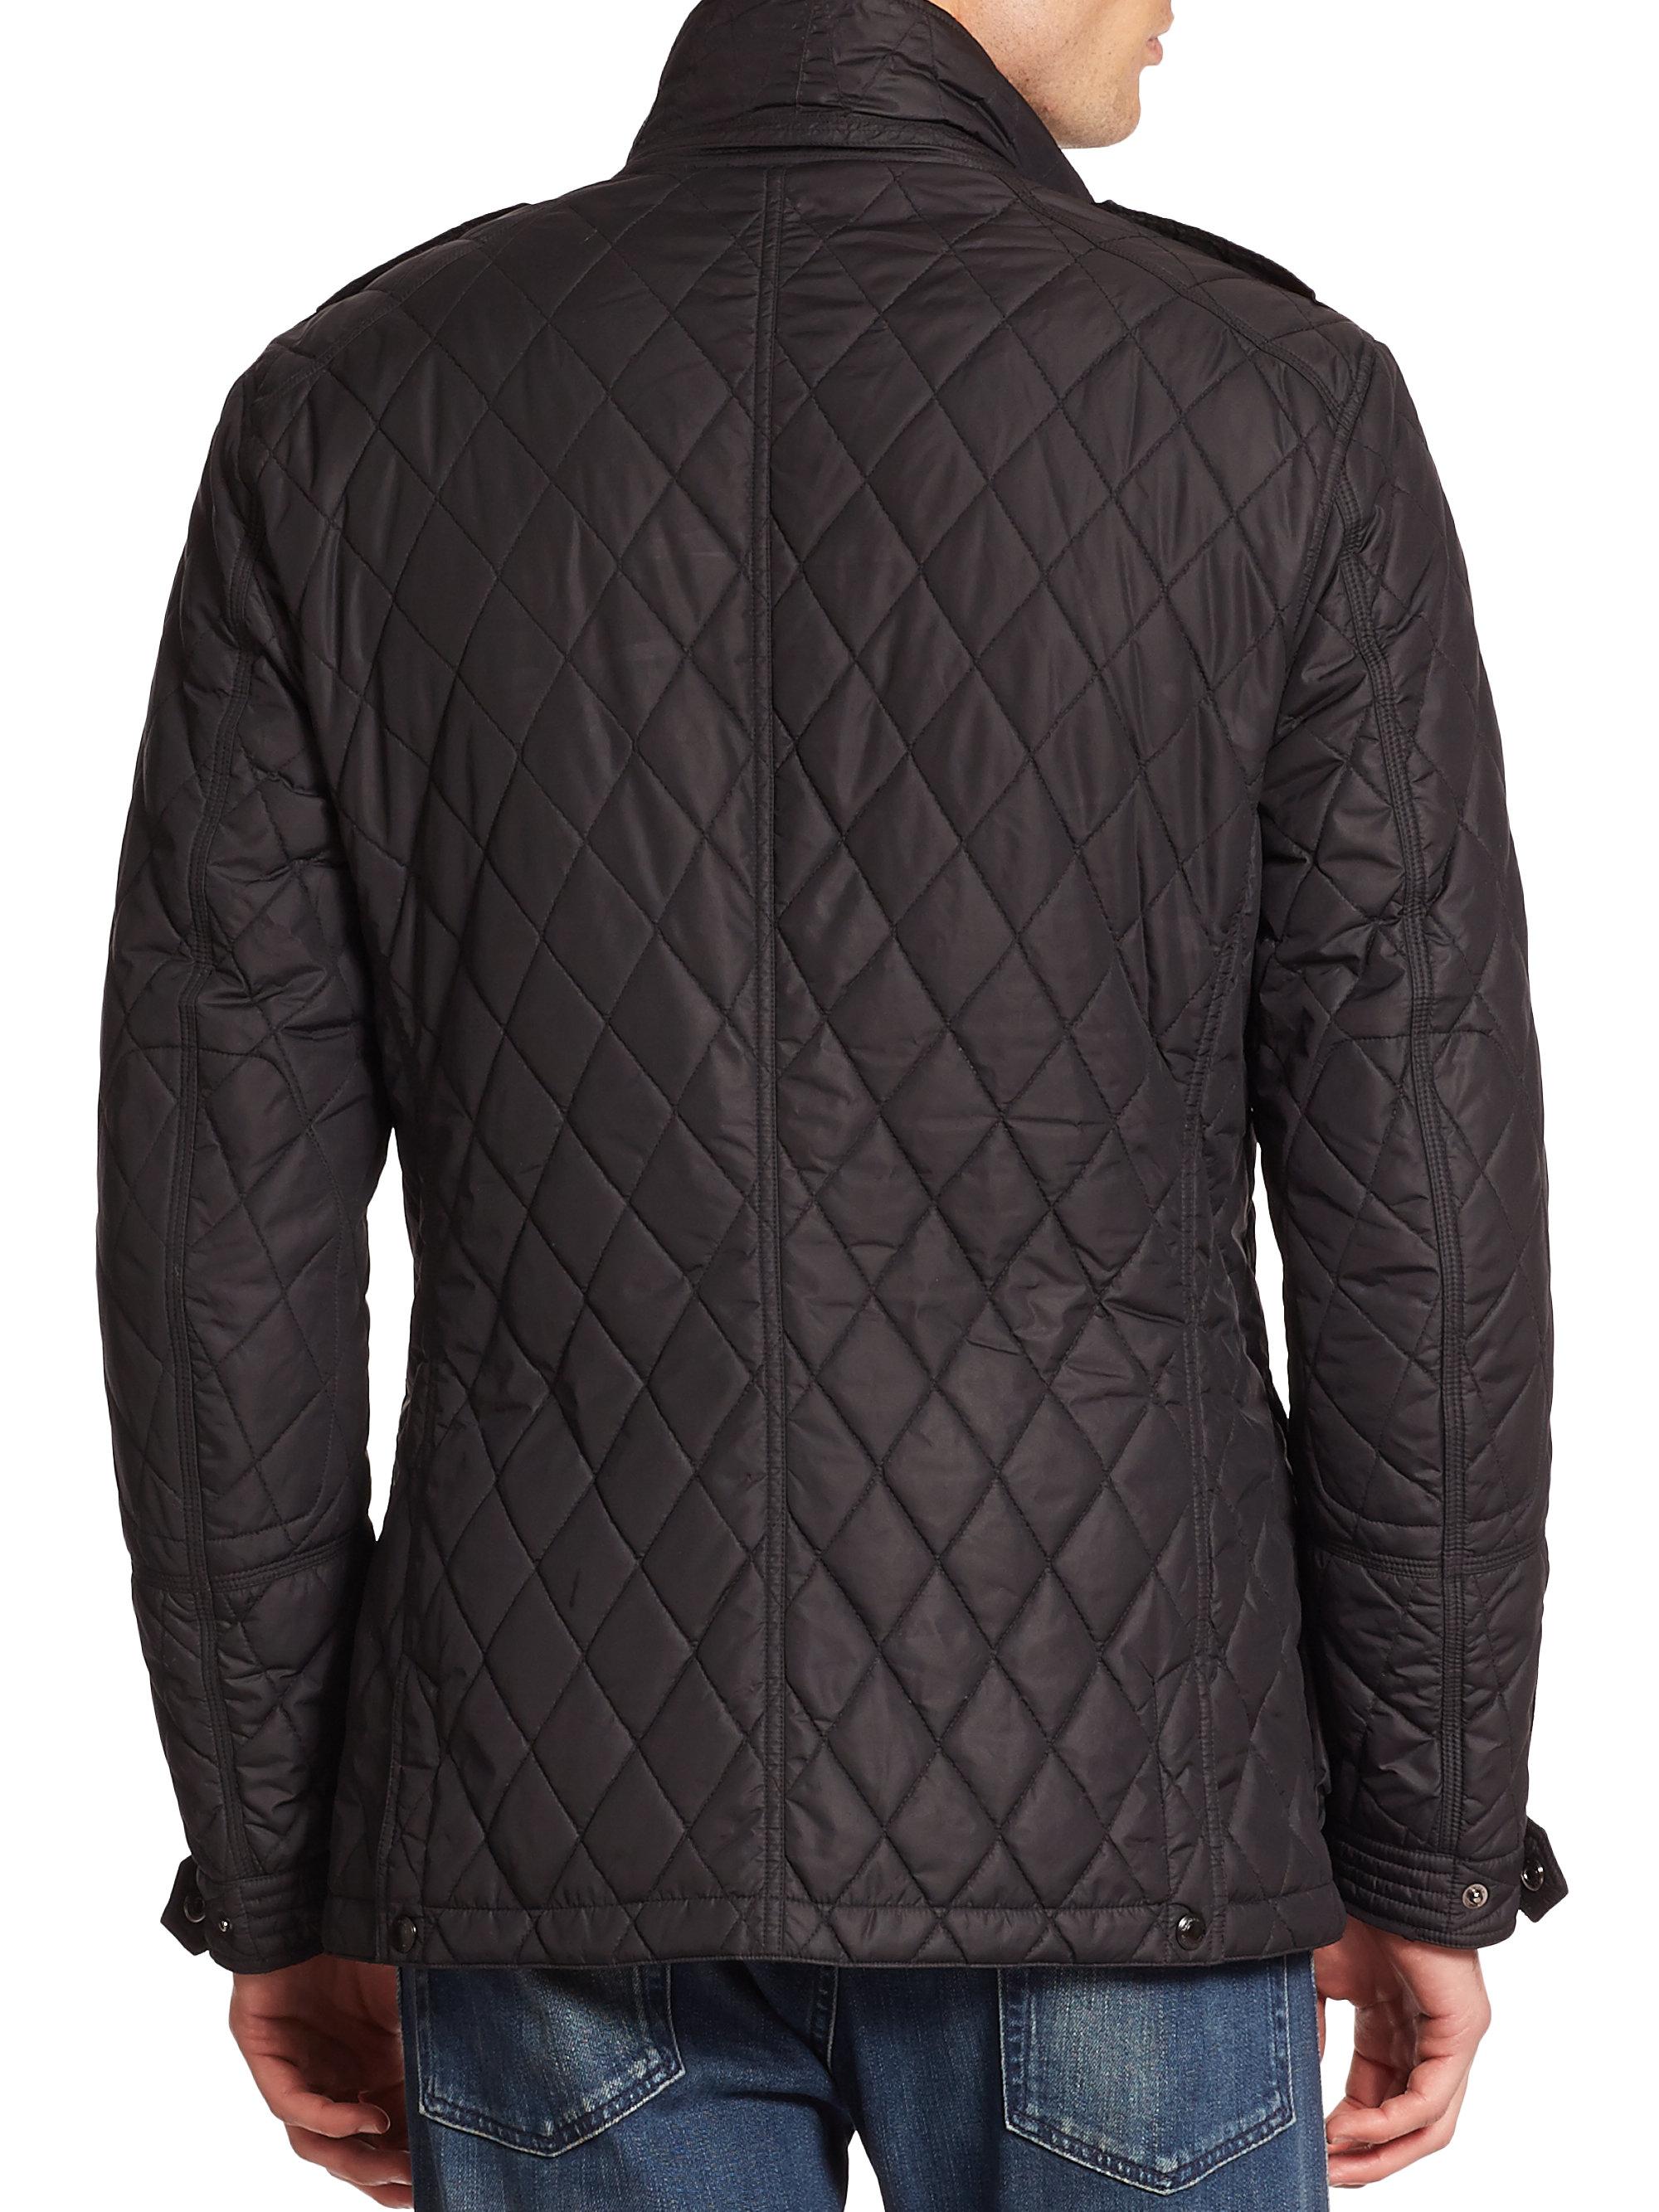 Lyst Ralph Lauren Black Label Quilted Sport Jacket In